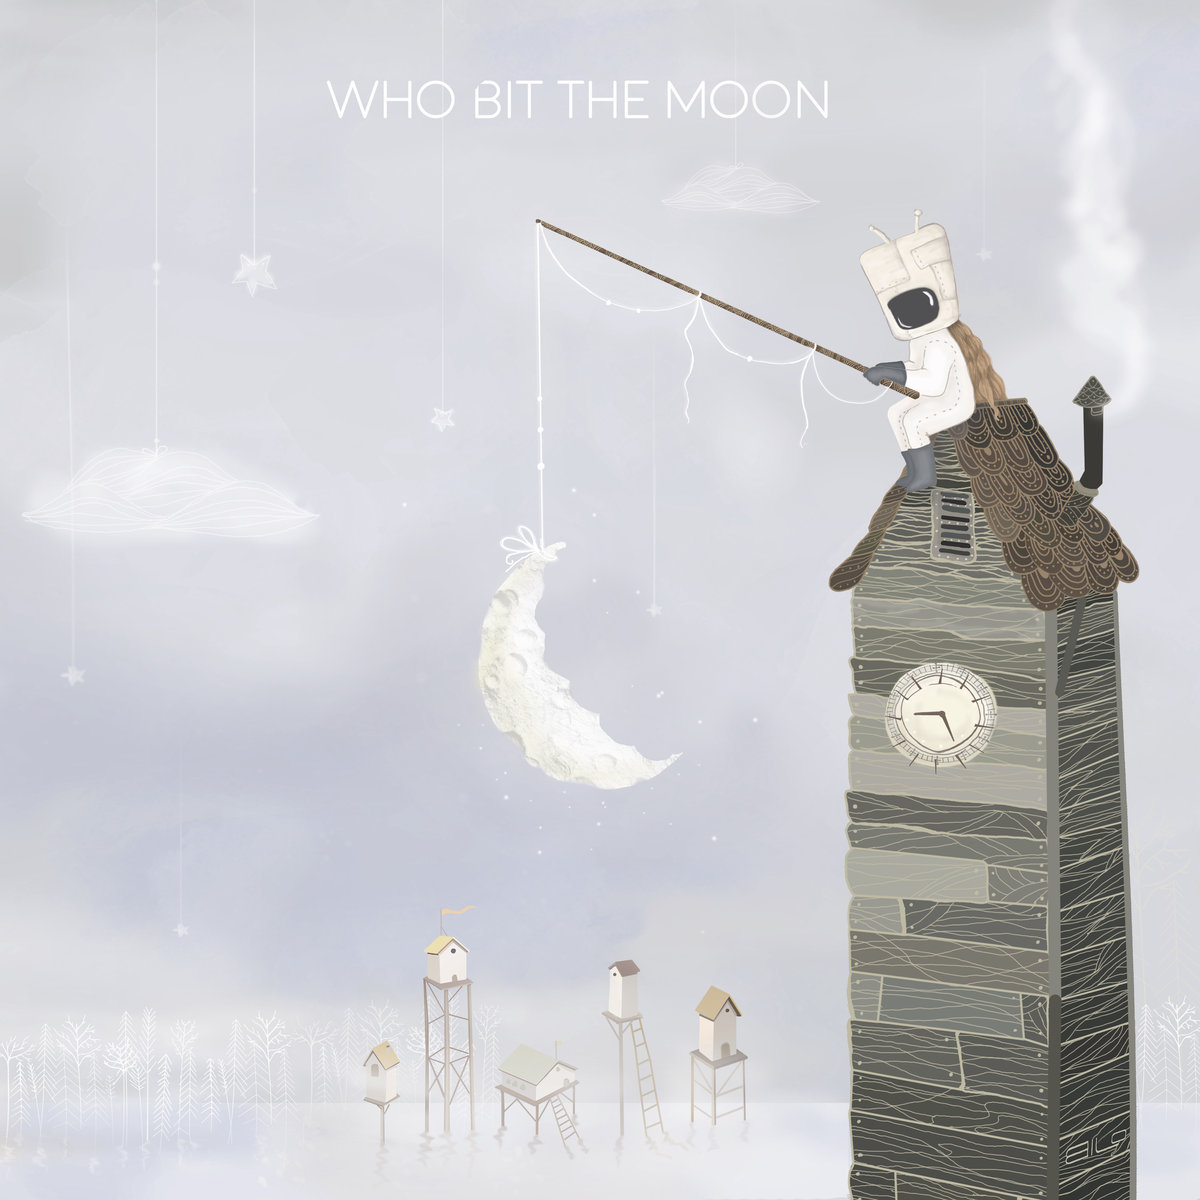 David Maxim Micic: Who Bit the Moon